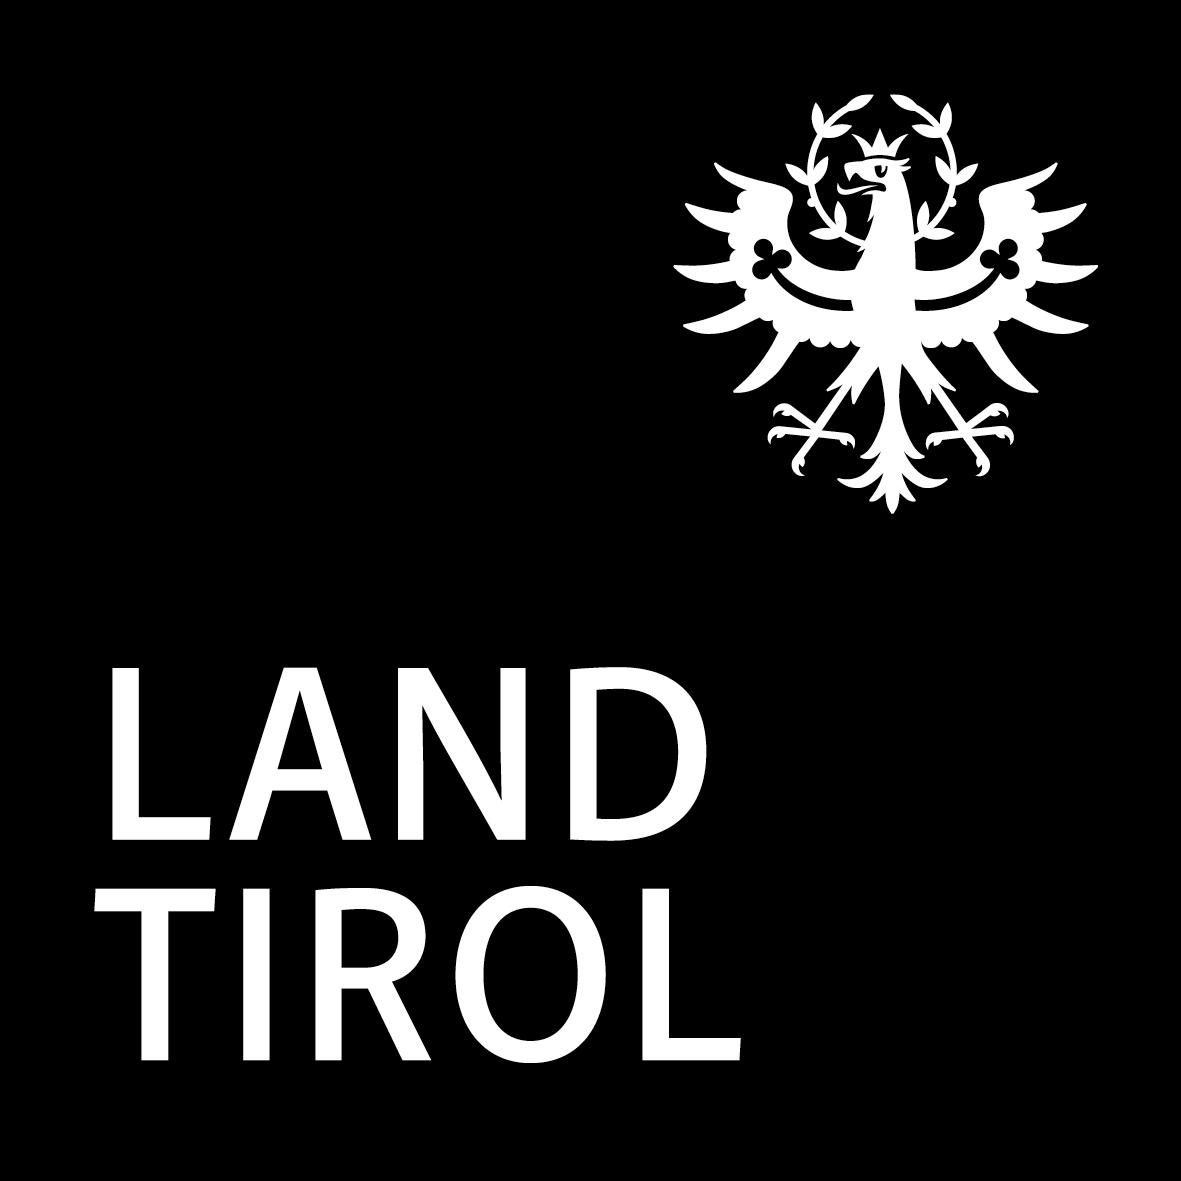 Landeslogo vom Land Tirol